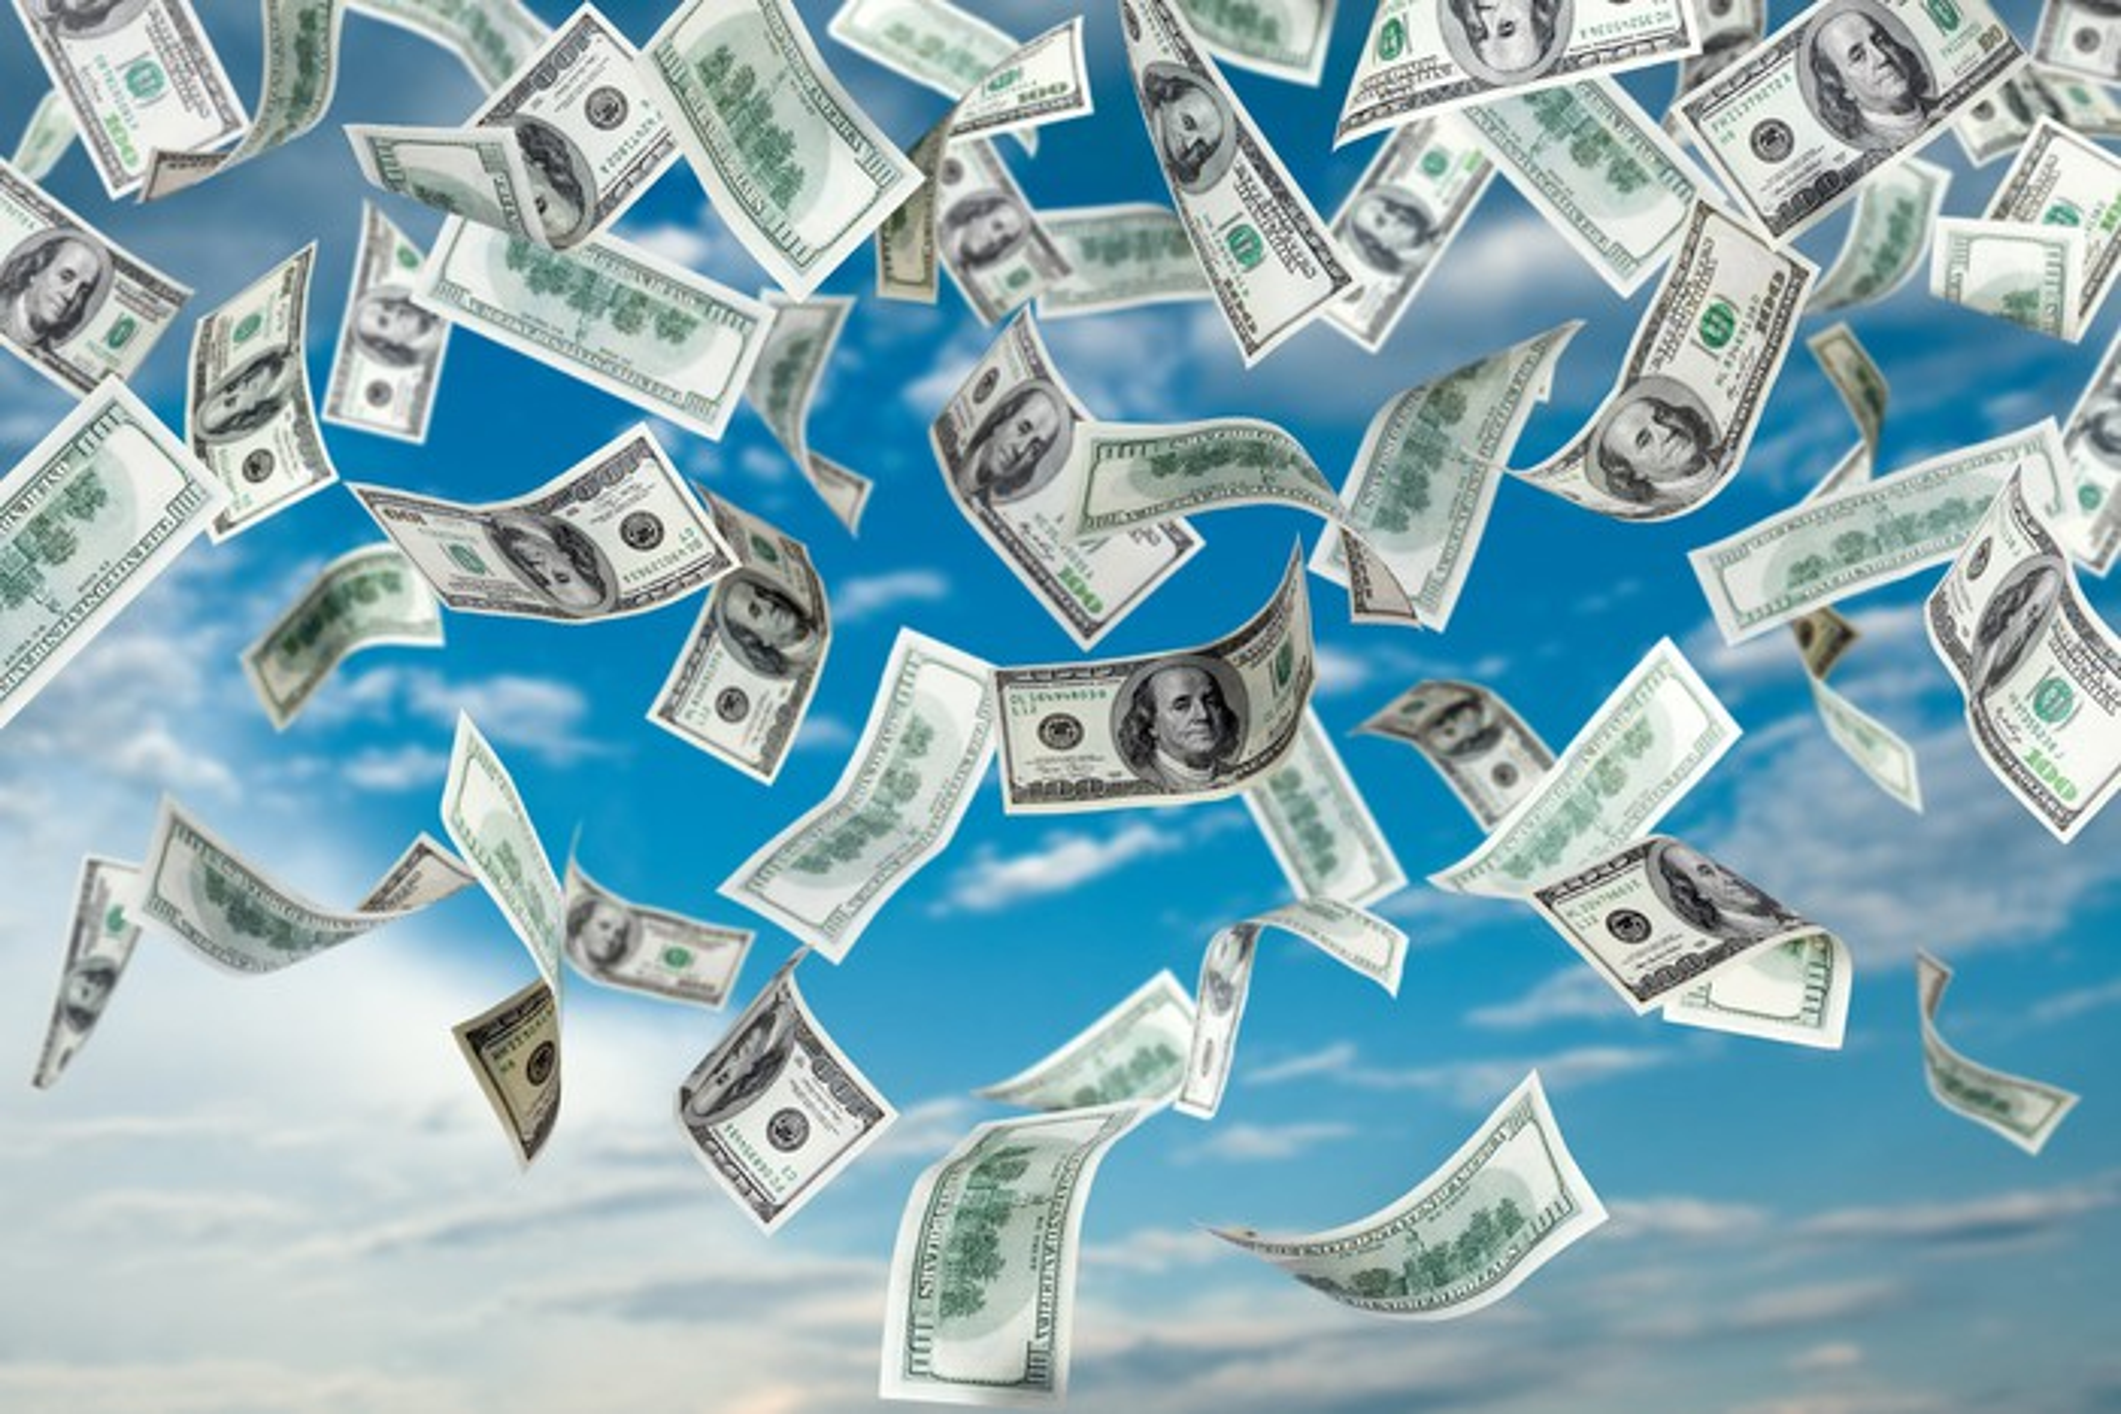 Hundred-dollar bills falling from the sky.